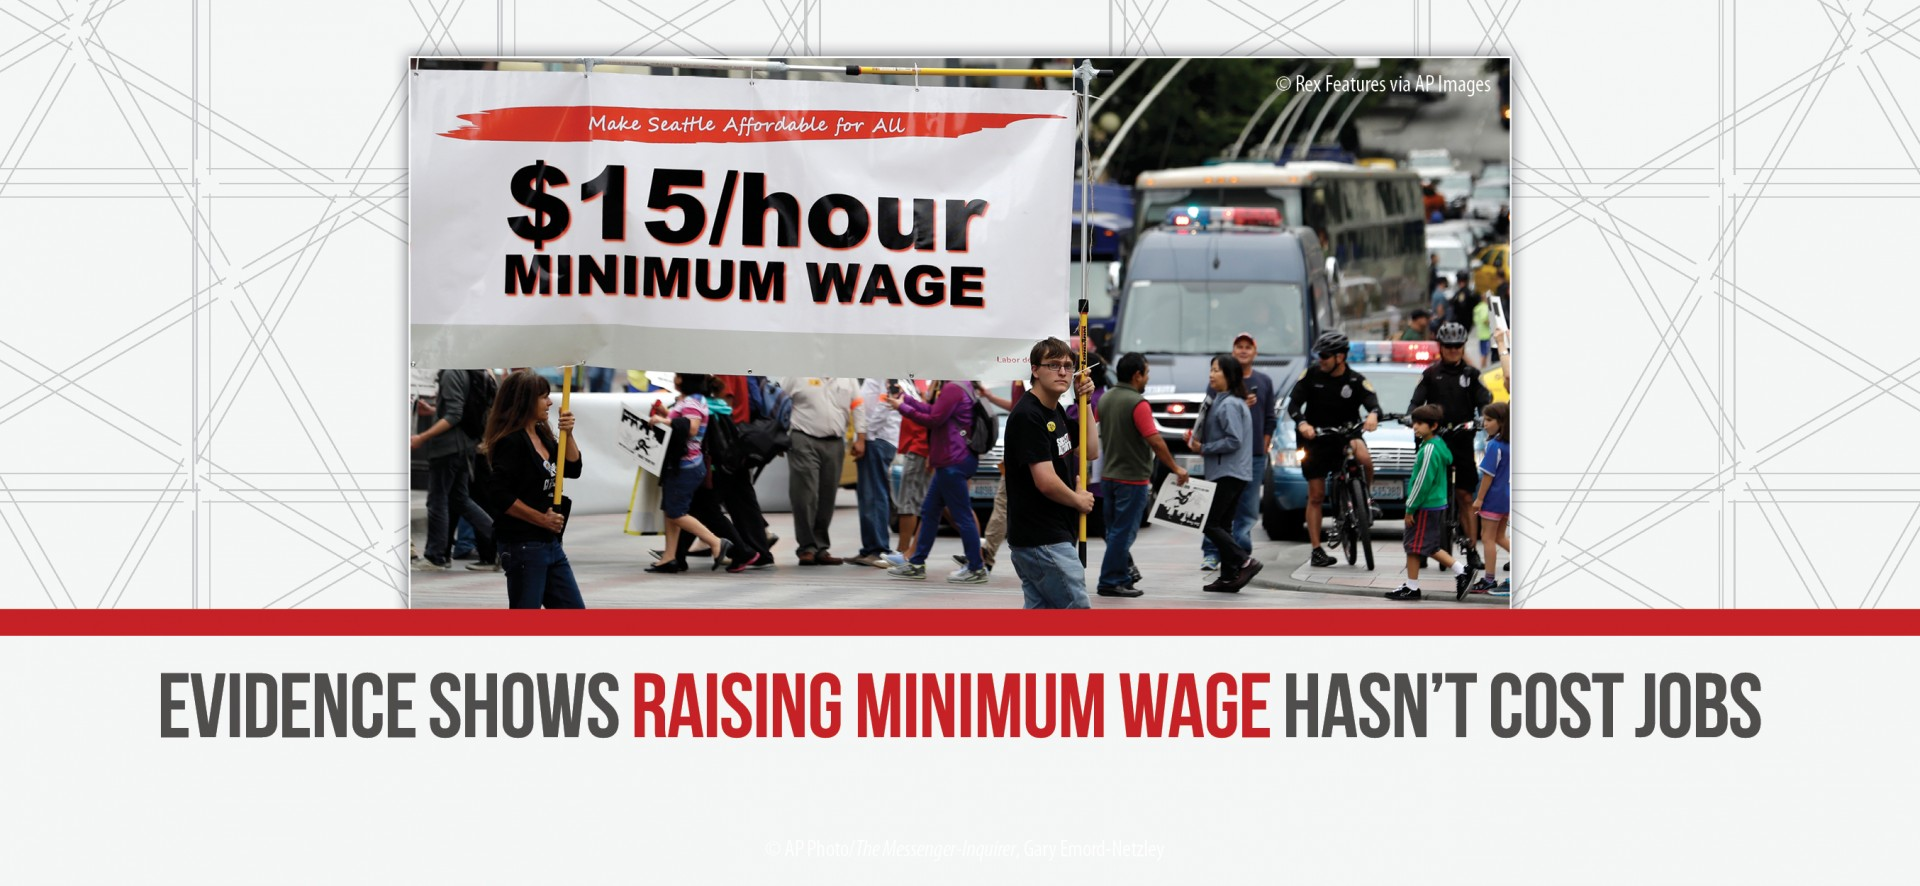 001 Minimum Wage Argumentative Essay Example Sample Of For